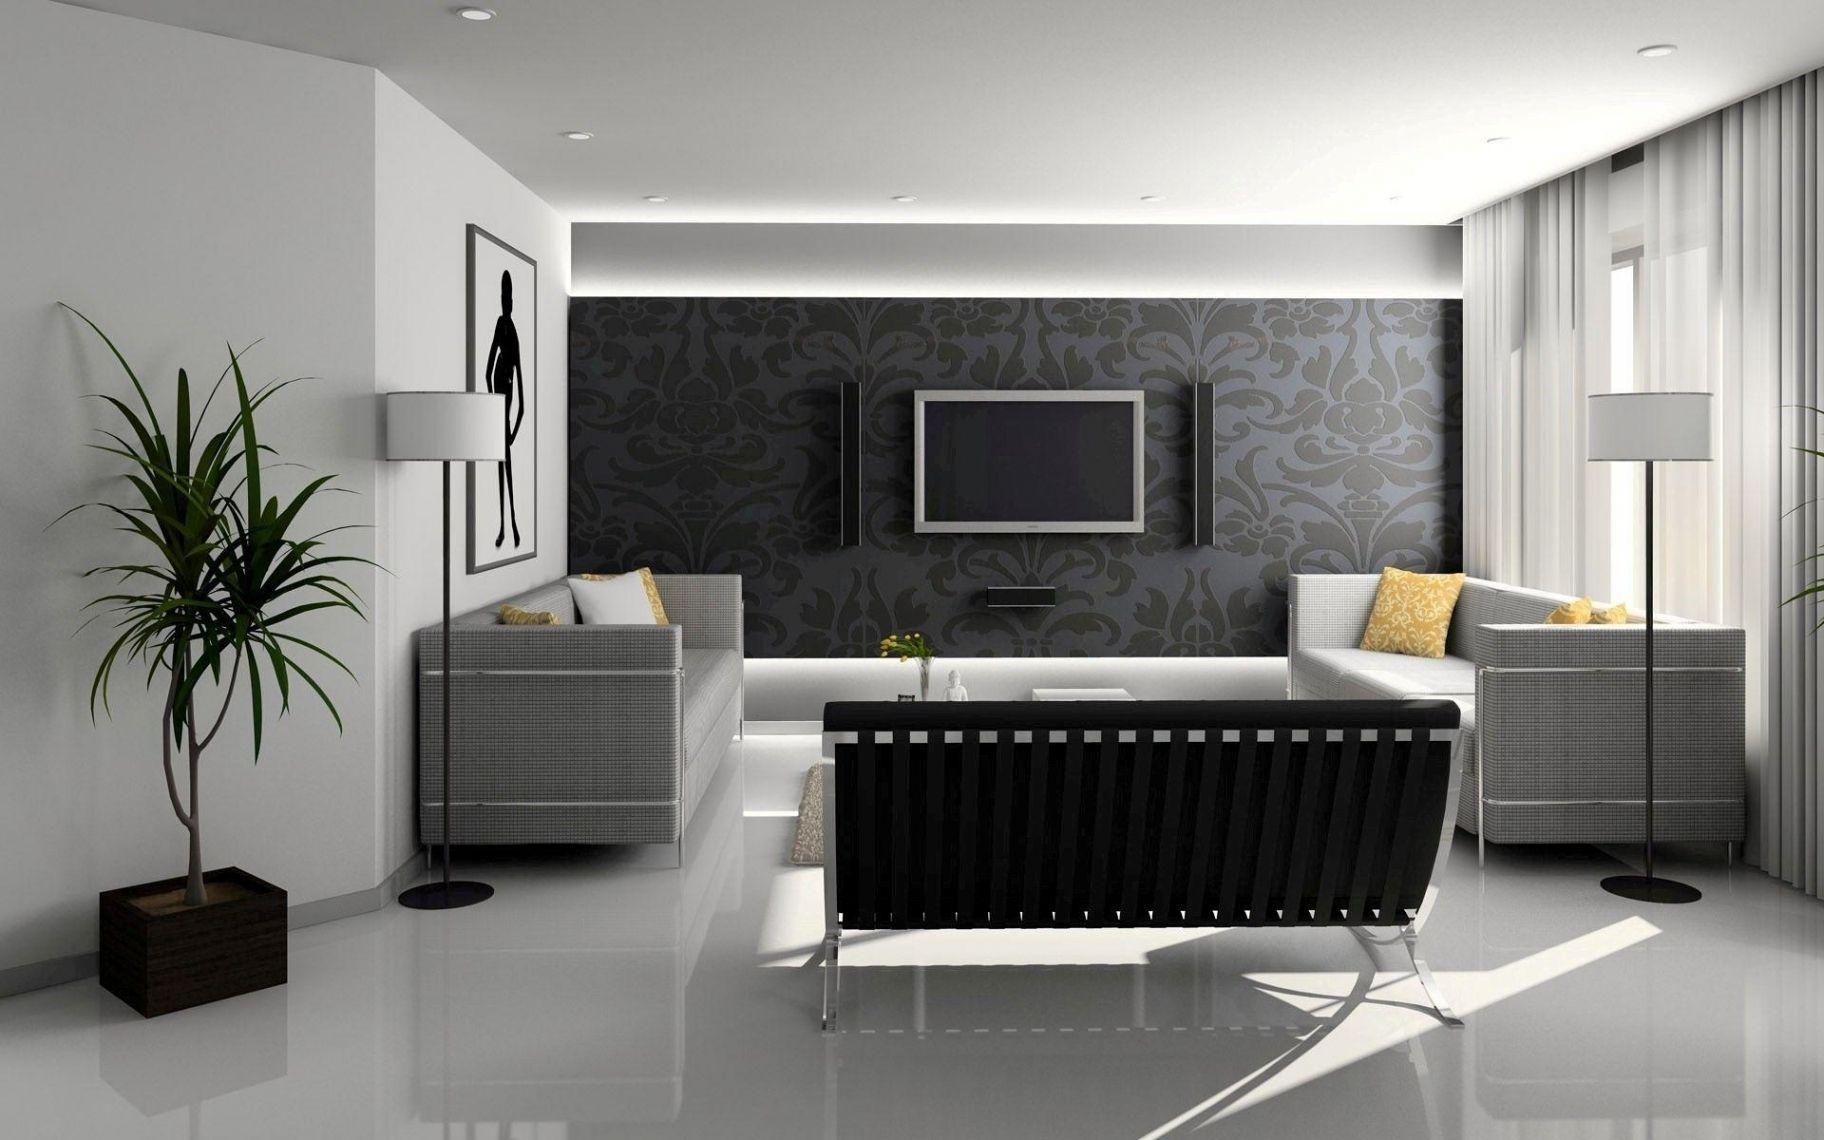 Wohnzimmer Heilbronn ~ Best wohnzimmer ideen images living room ideas